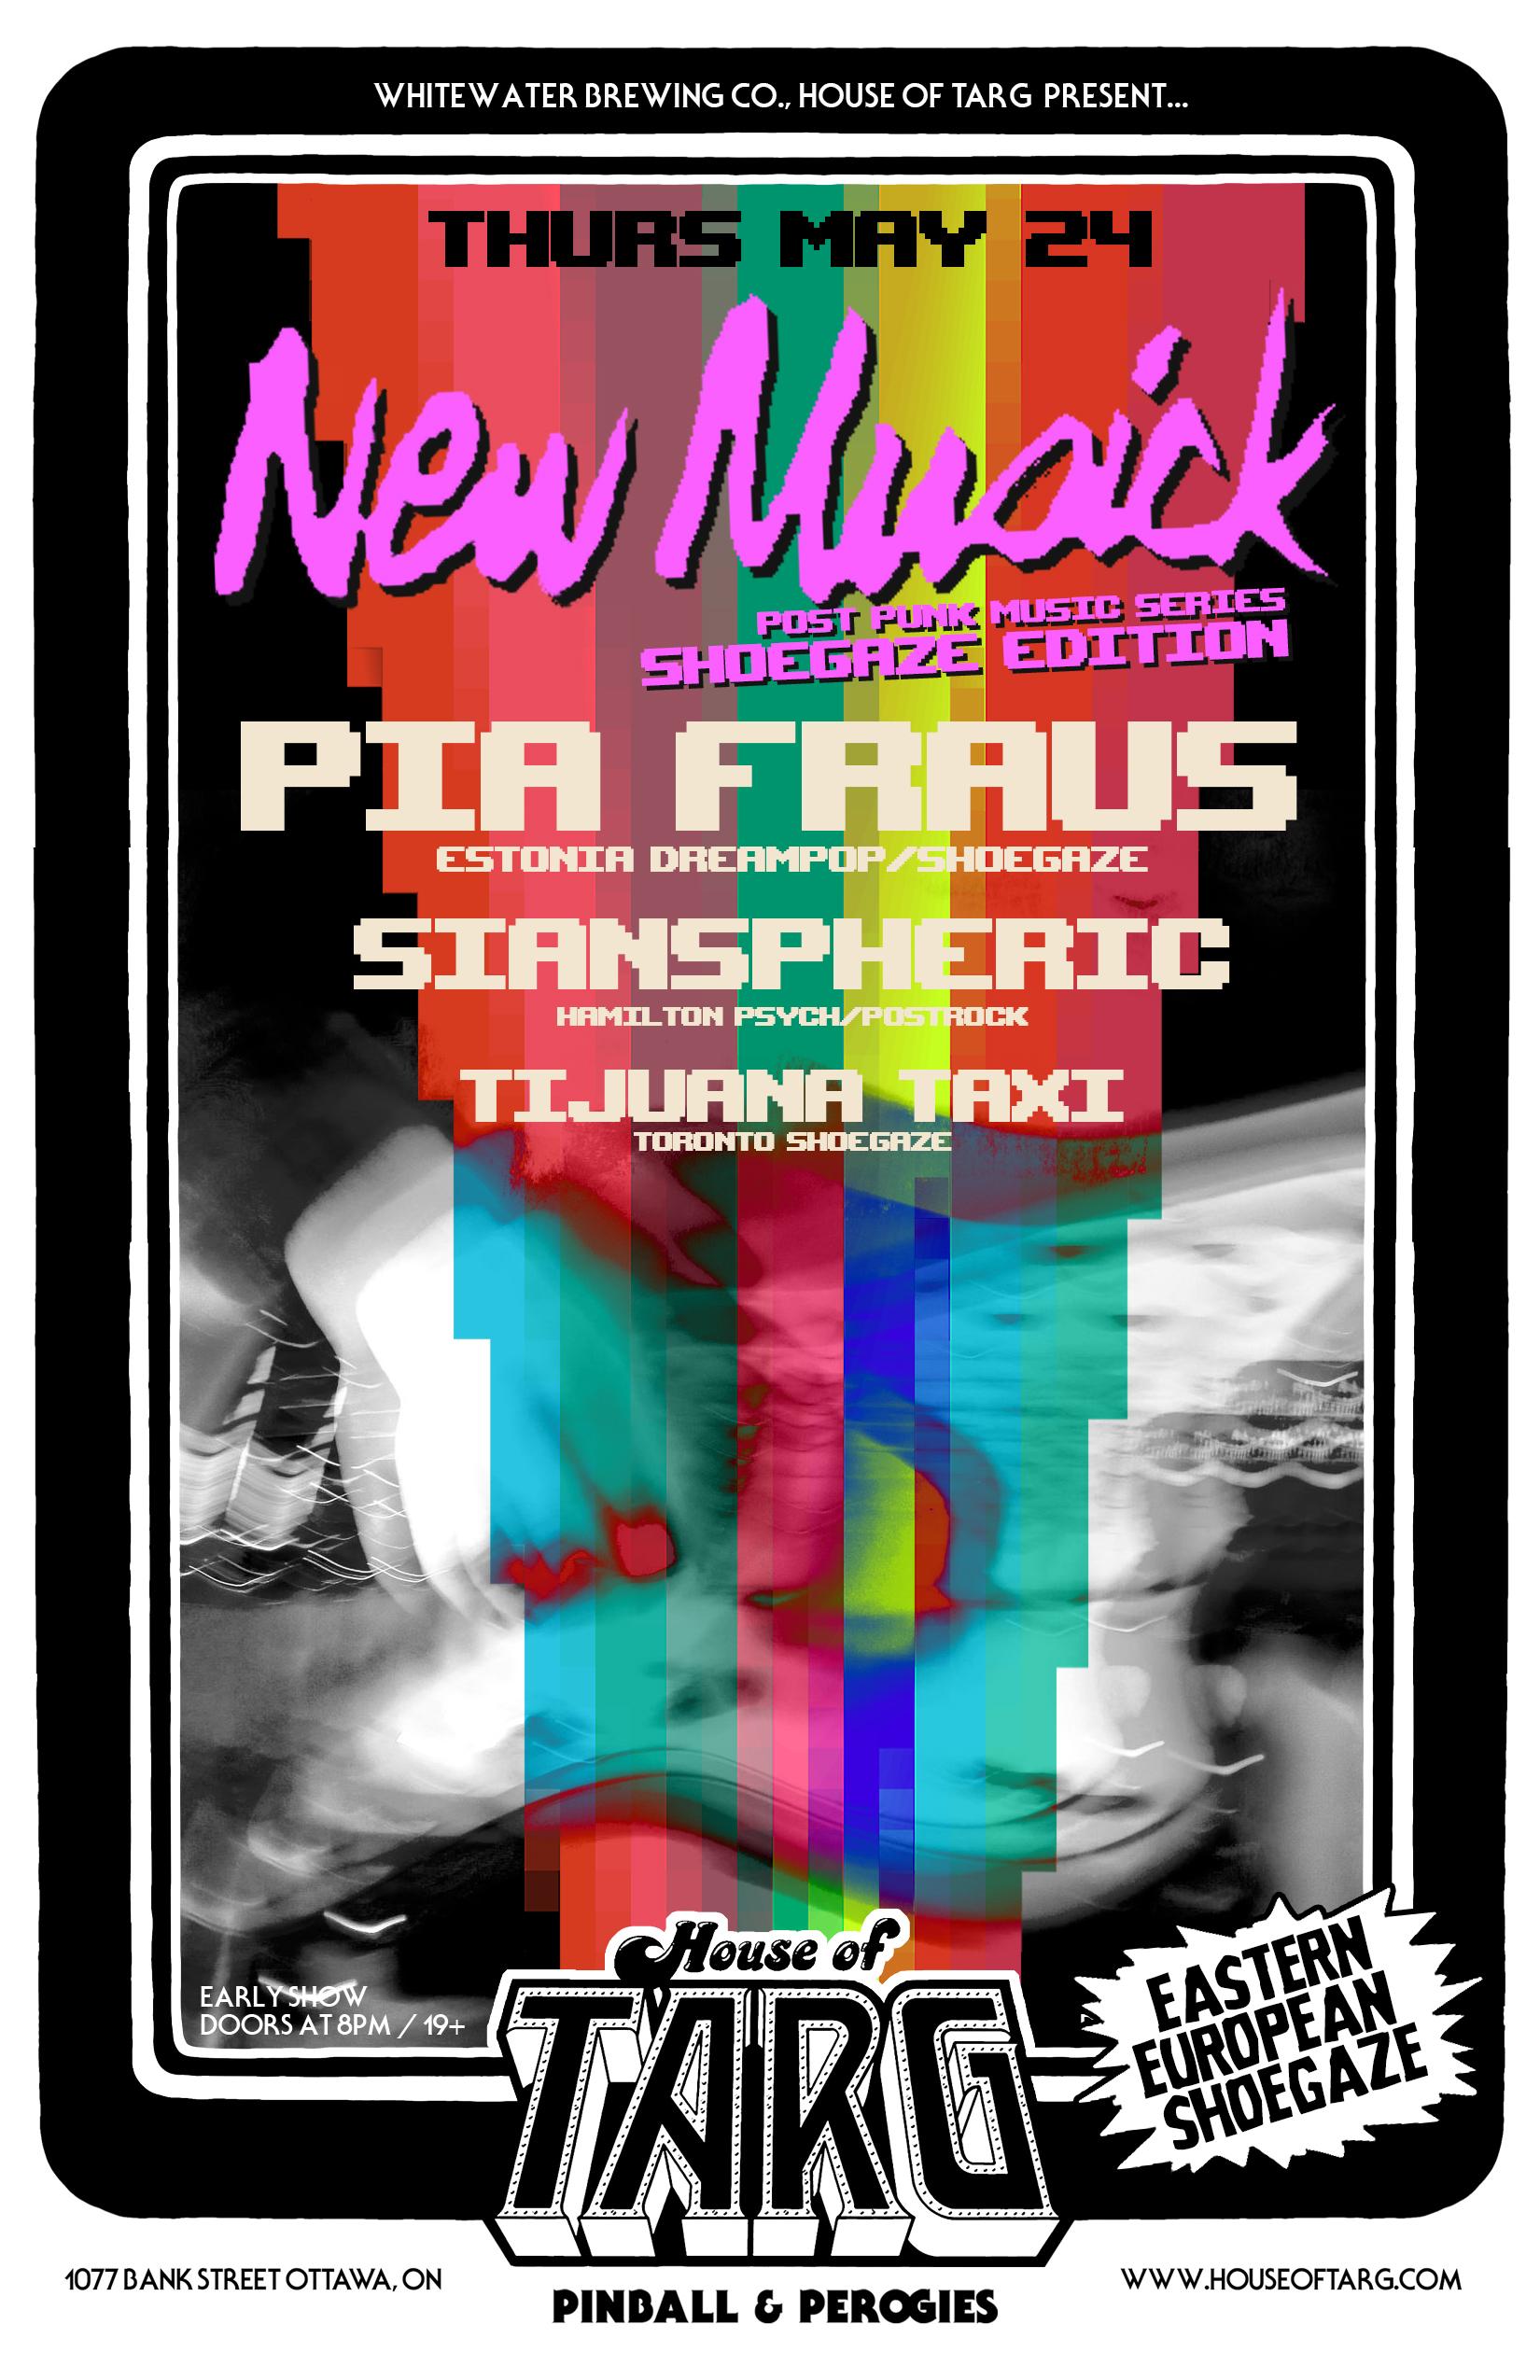 NEW MUSICK w/ Pia Fraus (Estonia) + SIANspheric + Tijuana Taxi